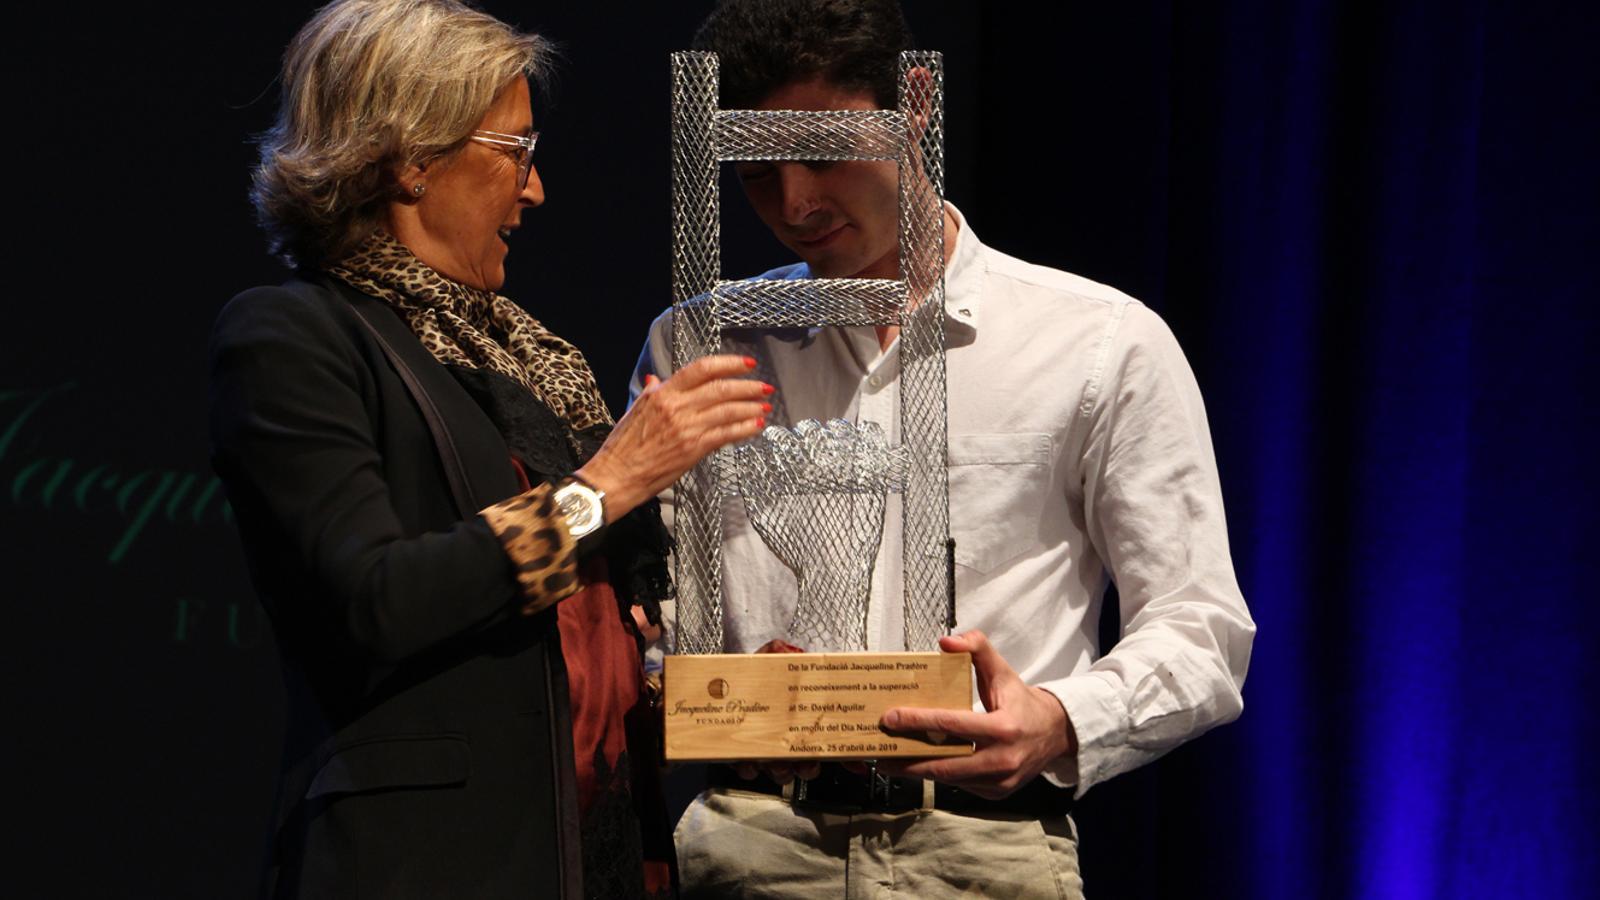 David Aguilar rep el primer premi Fundació Jacqueline Pradère. / T. N. (ANA)